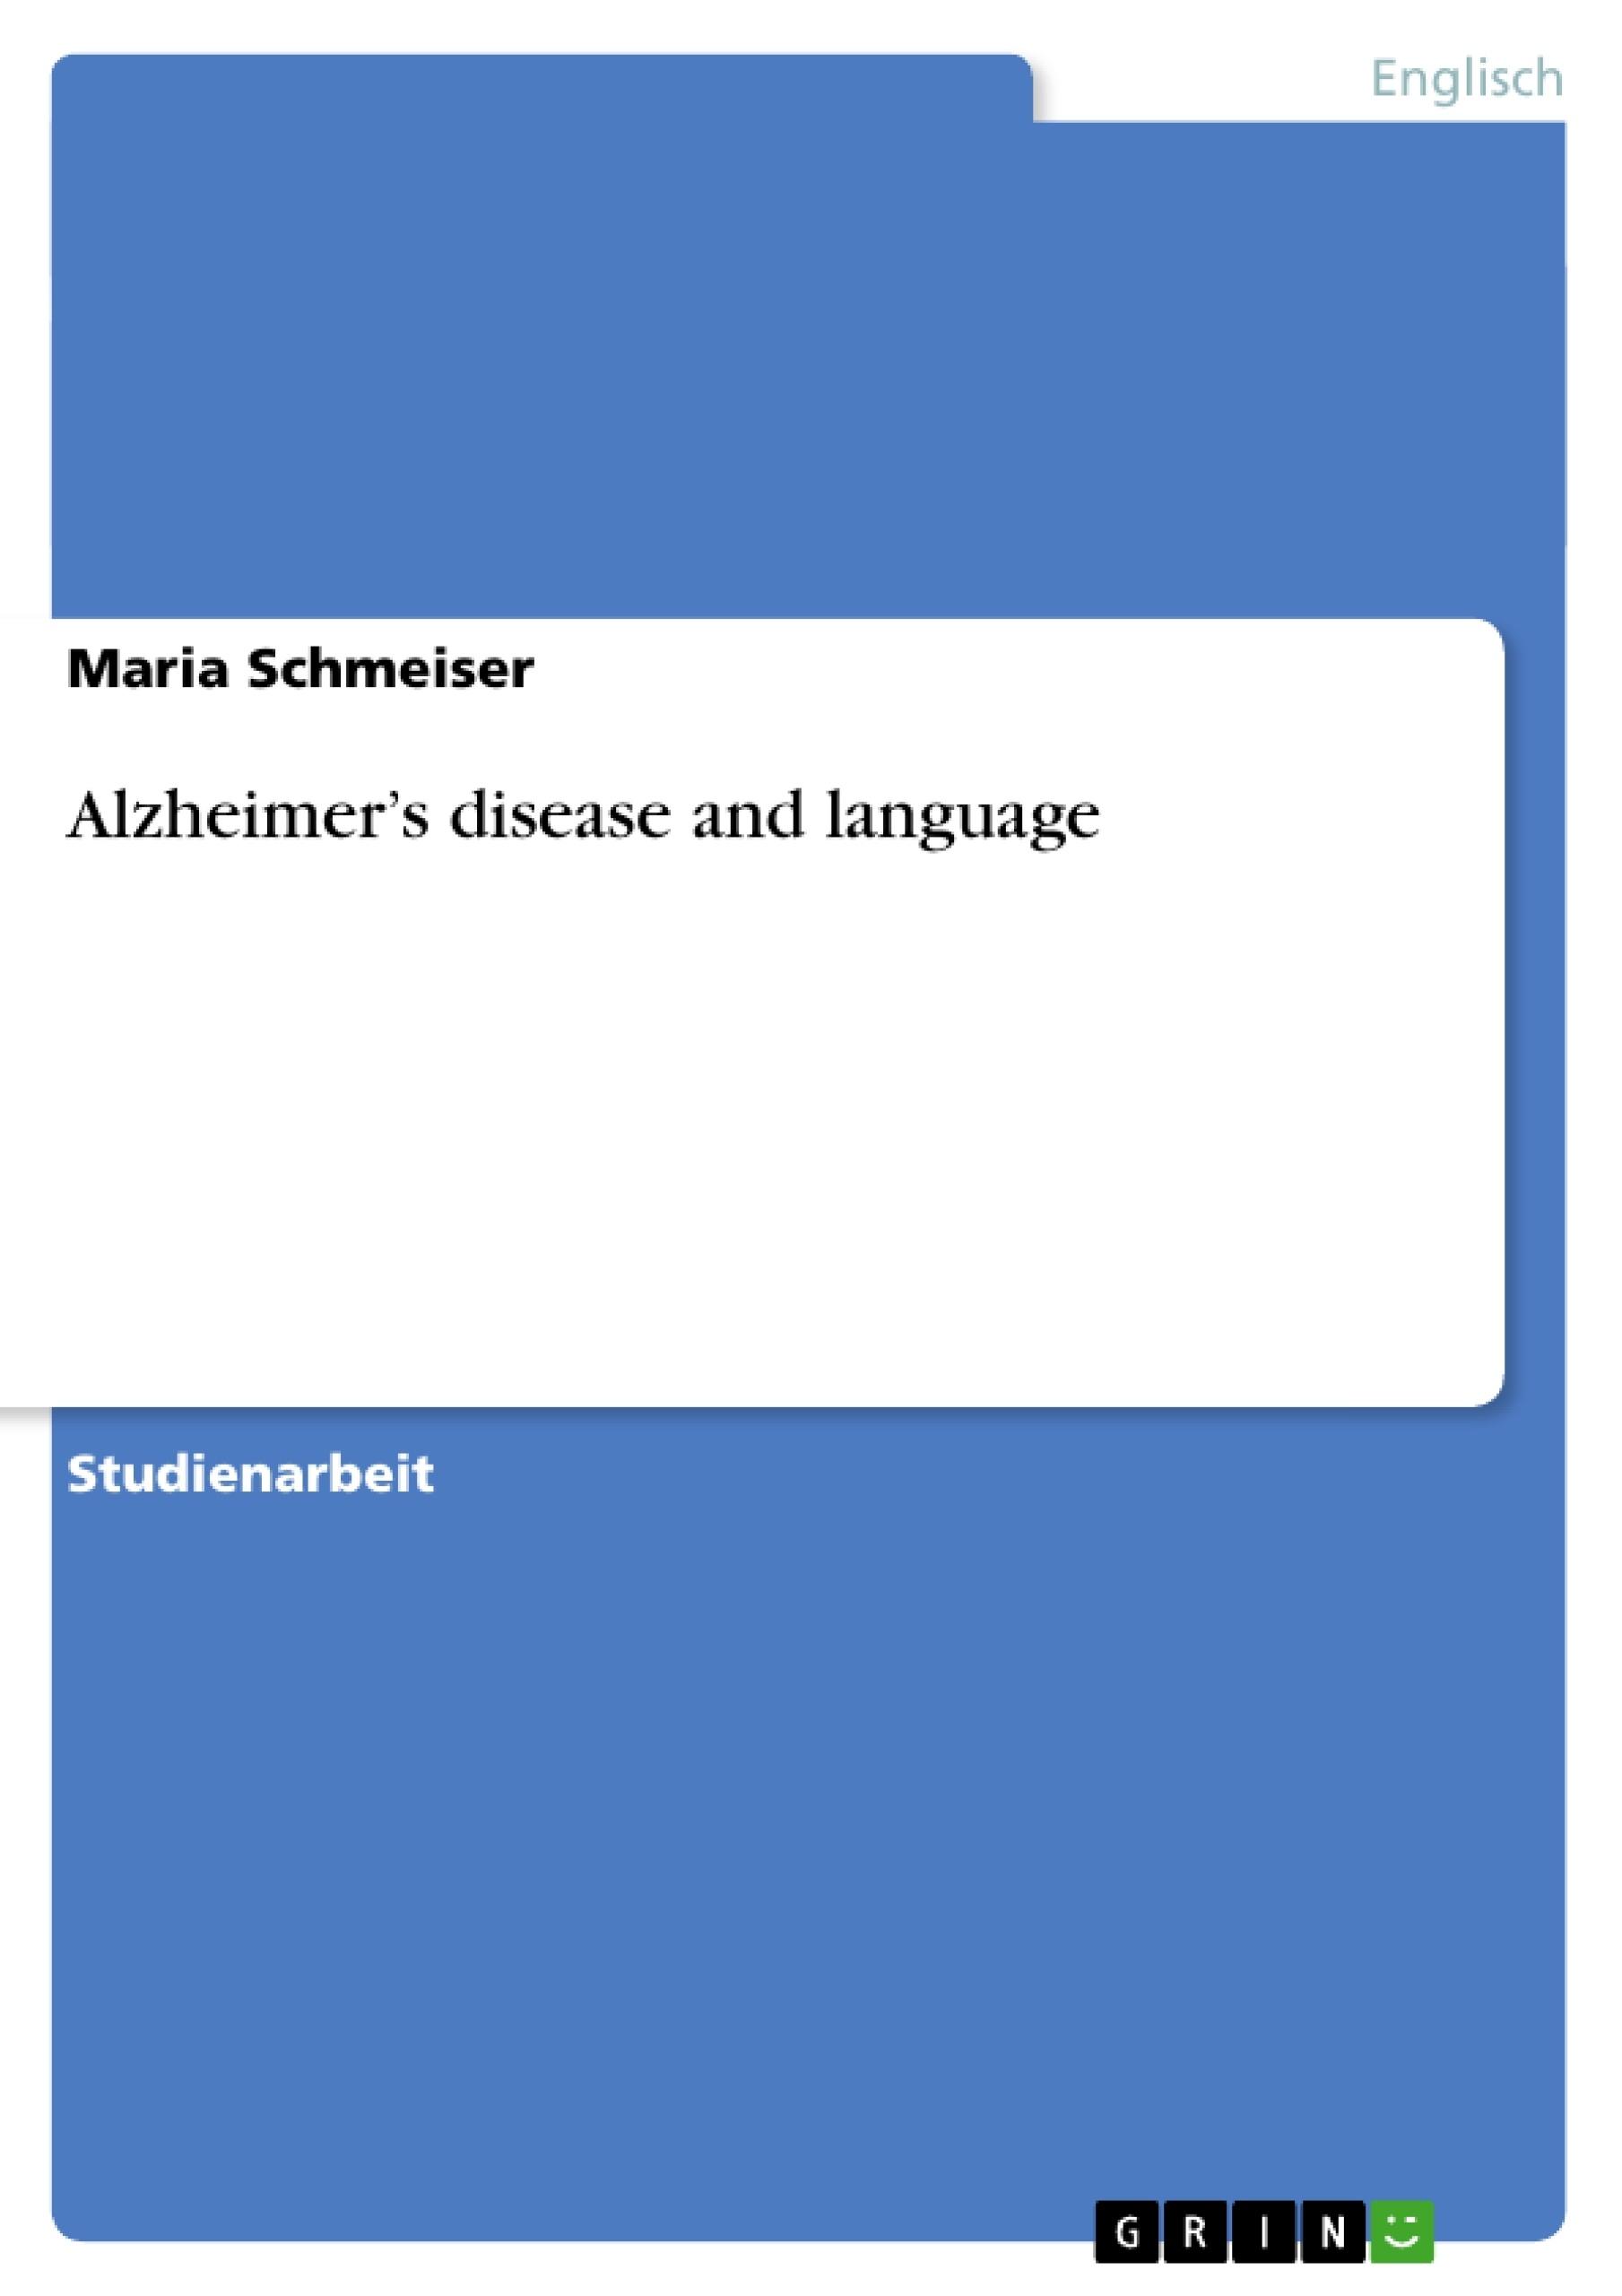 Titel: Alzheimer's disease and language